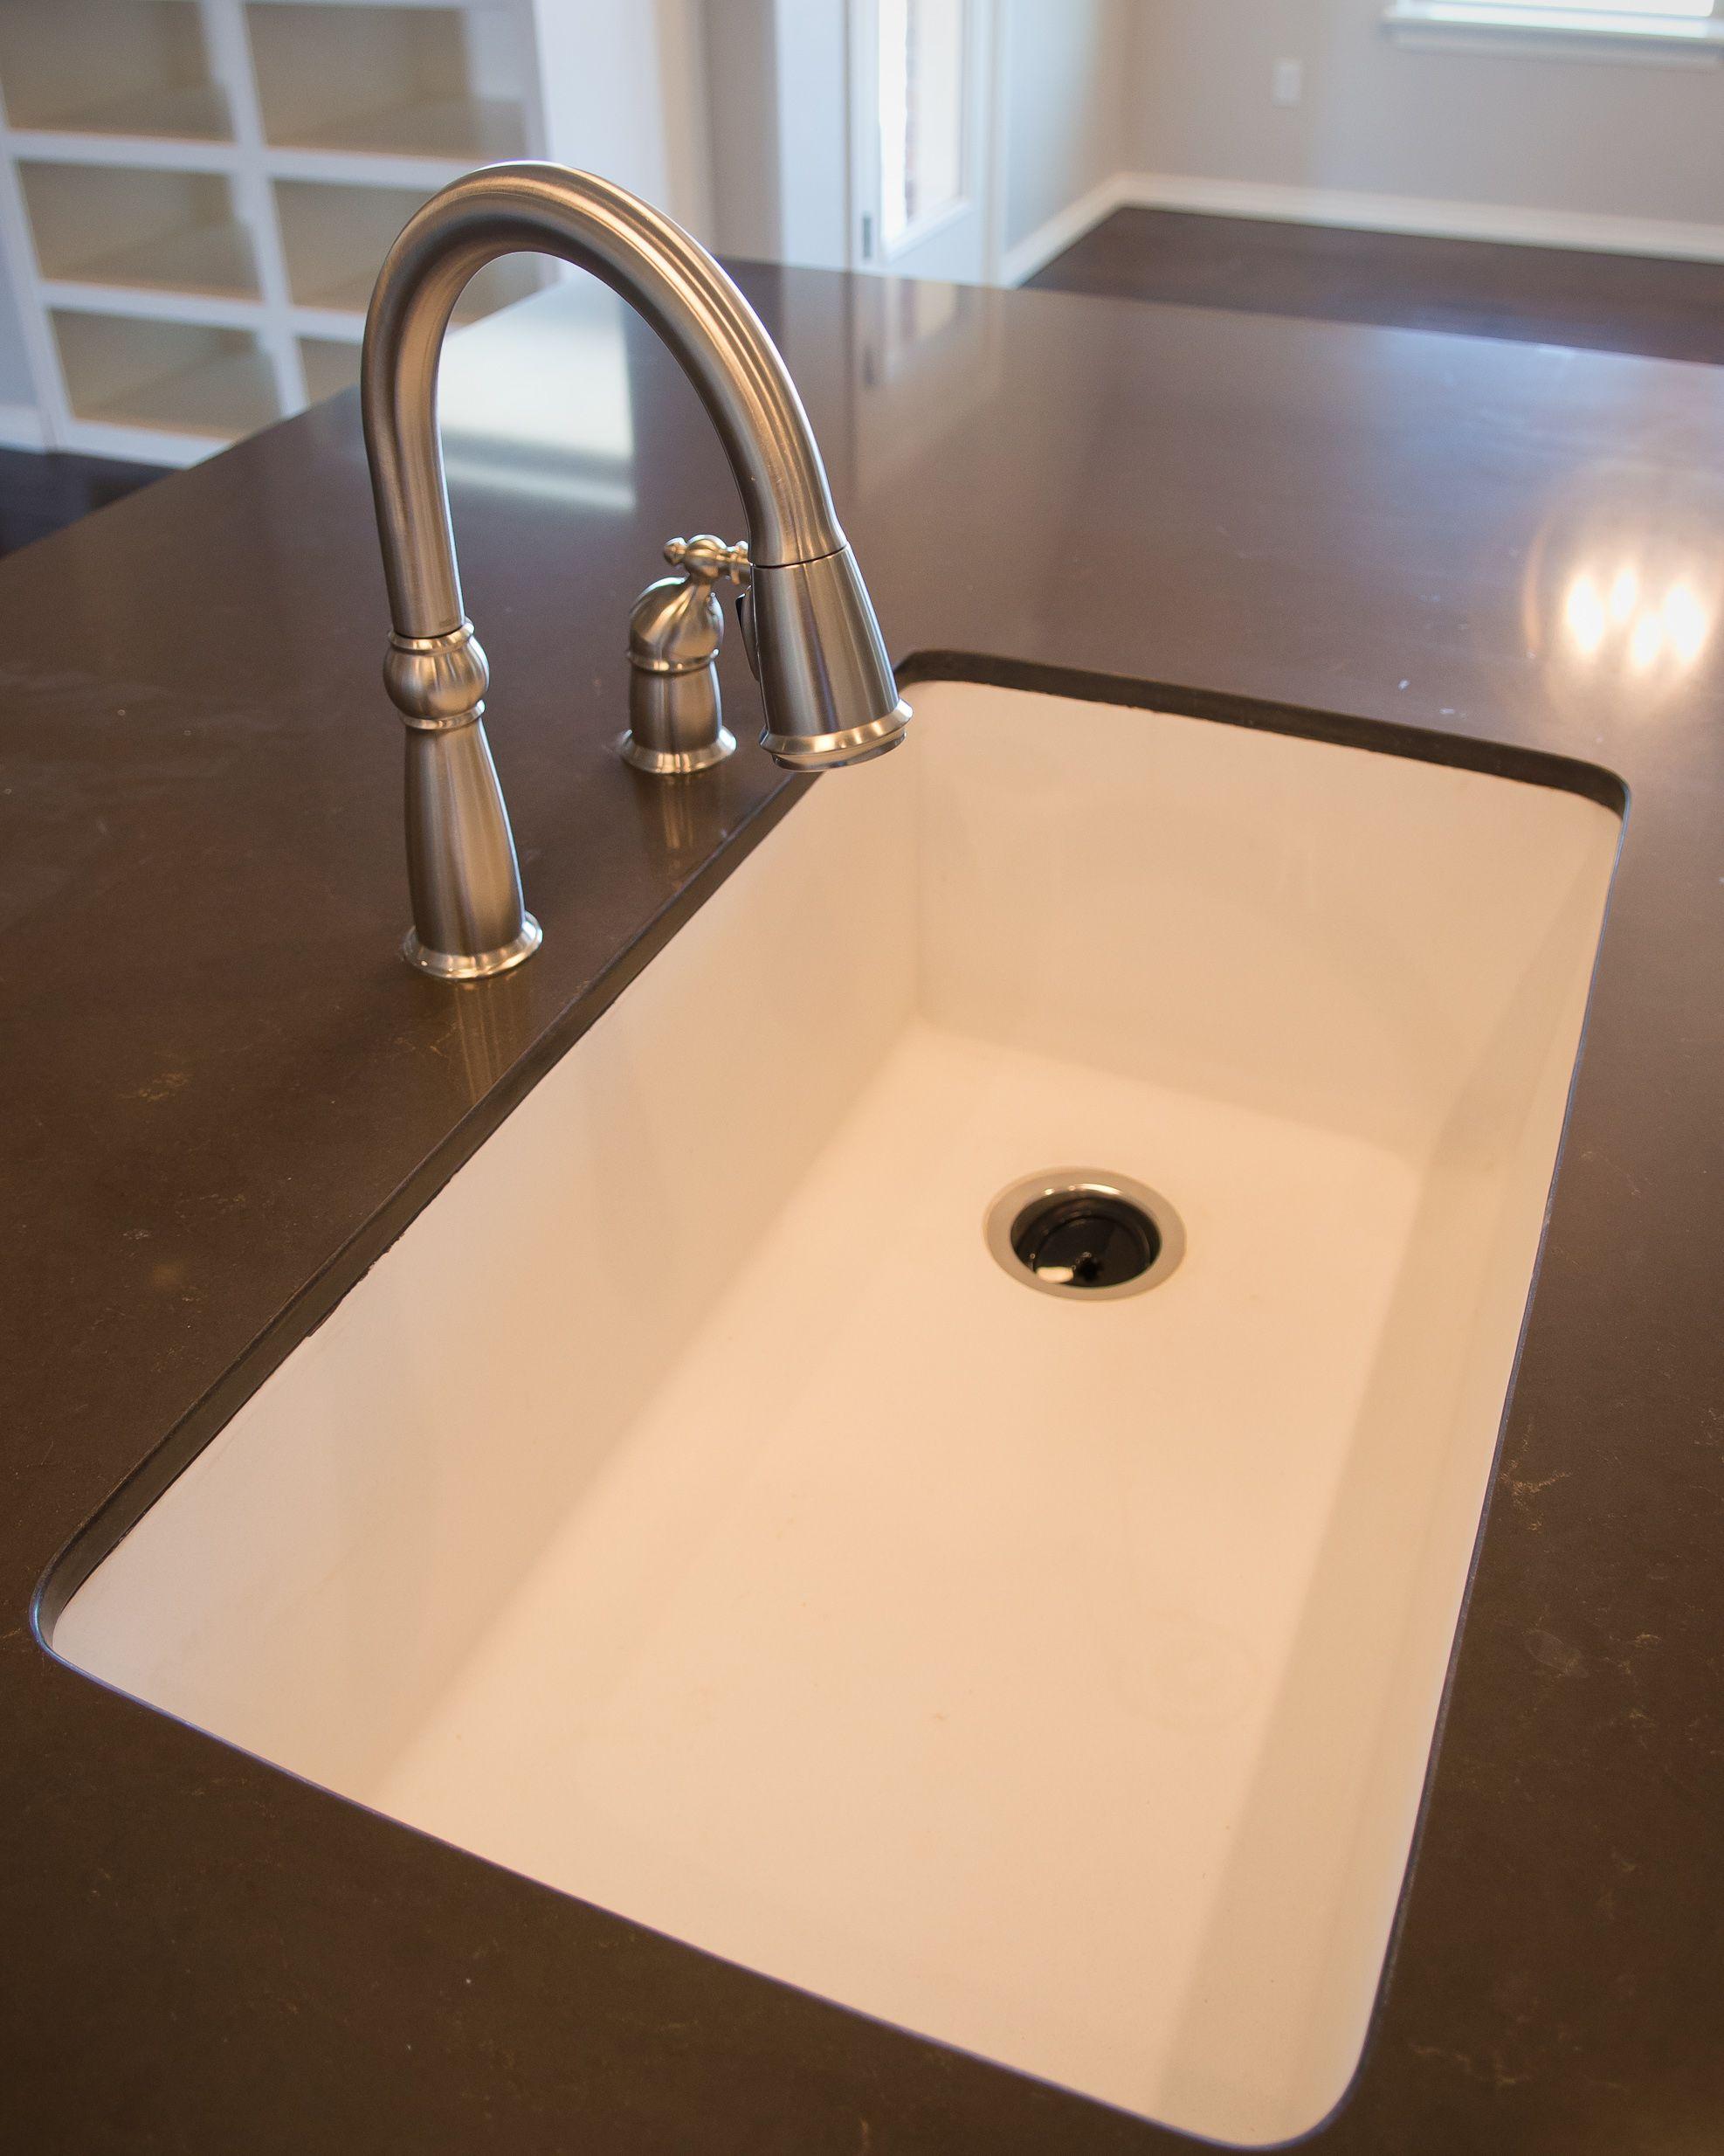 Delta leland kitchen faucet merope silestone and a white for Silestone kitchen sinks